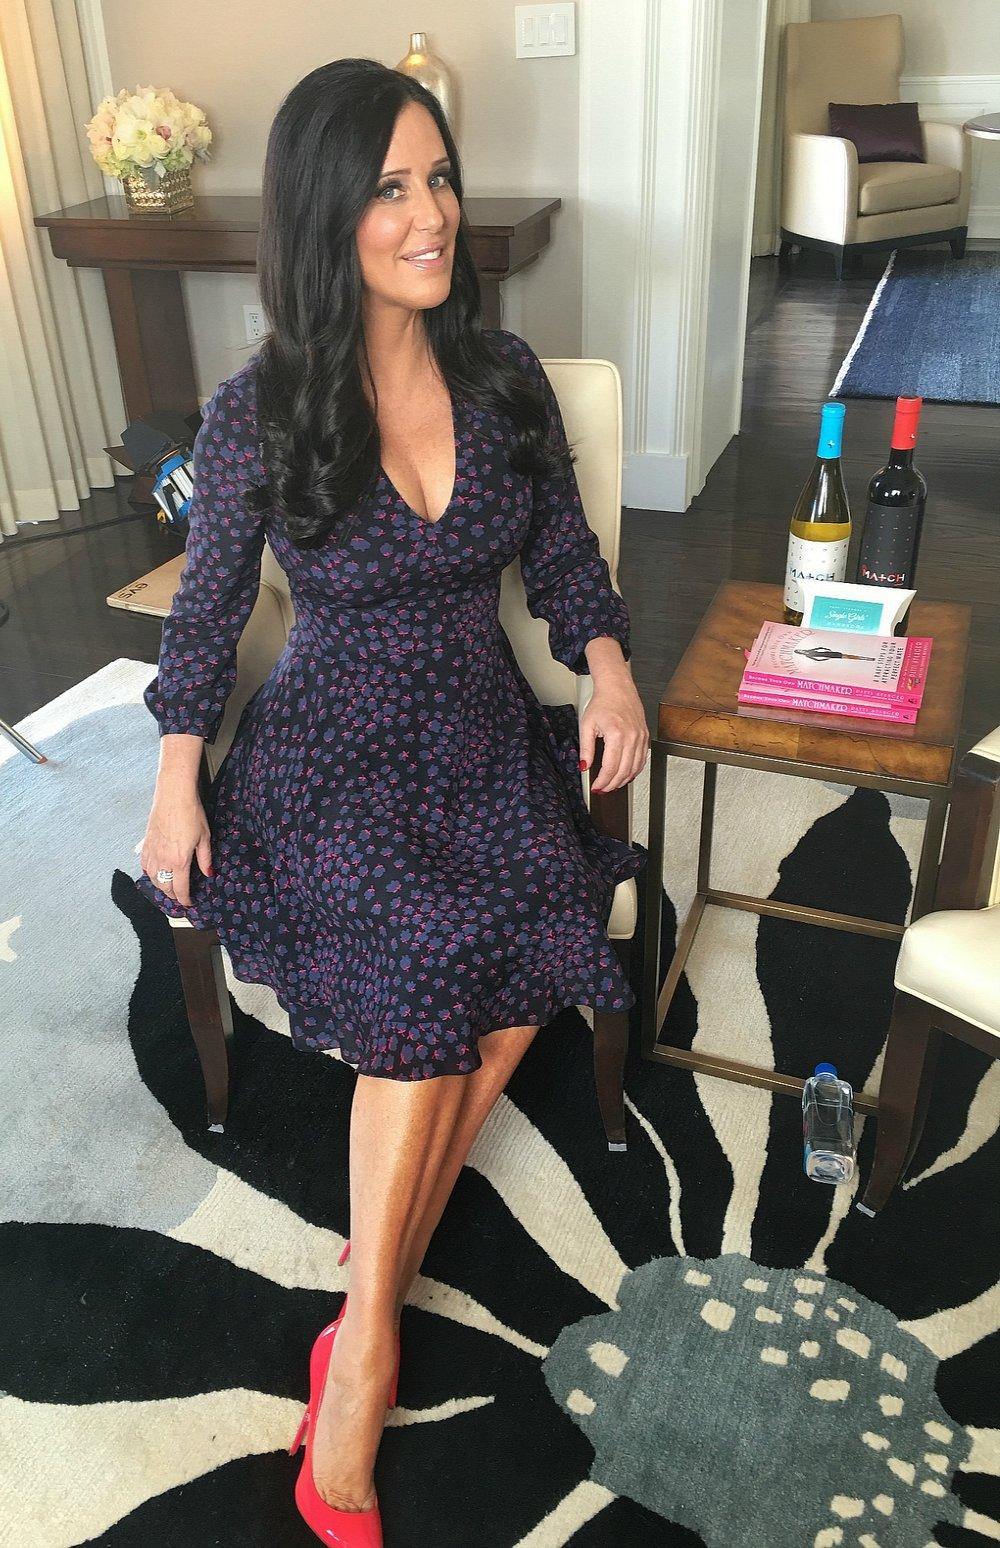 2015-Brides-Interview-Press-Patti-Stanger-Personal-Stylist-Los-Angeles-Wardrobe-Styling-LA.jpg